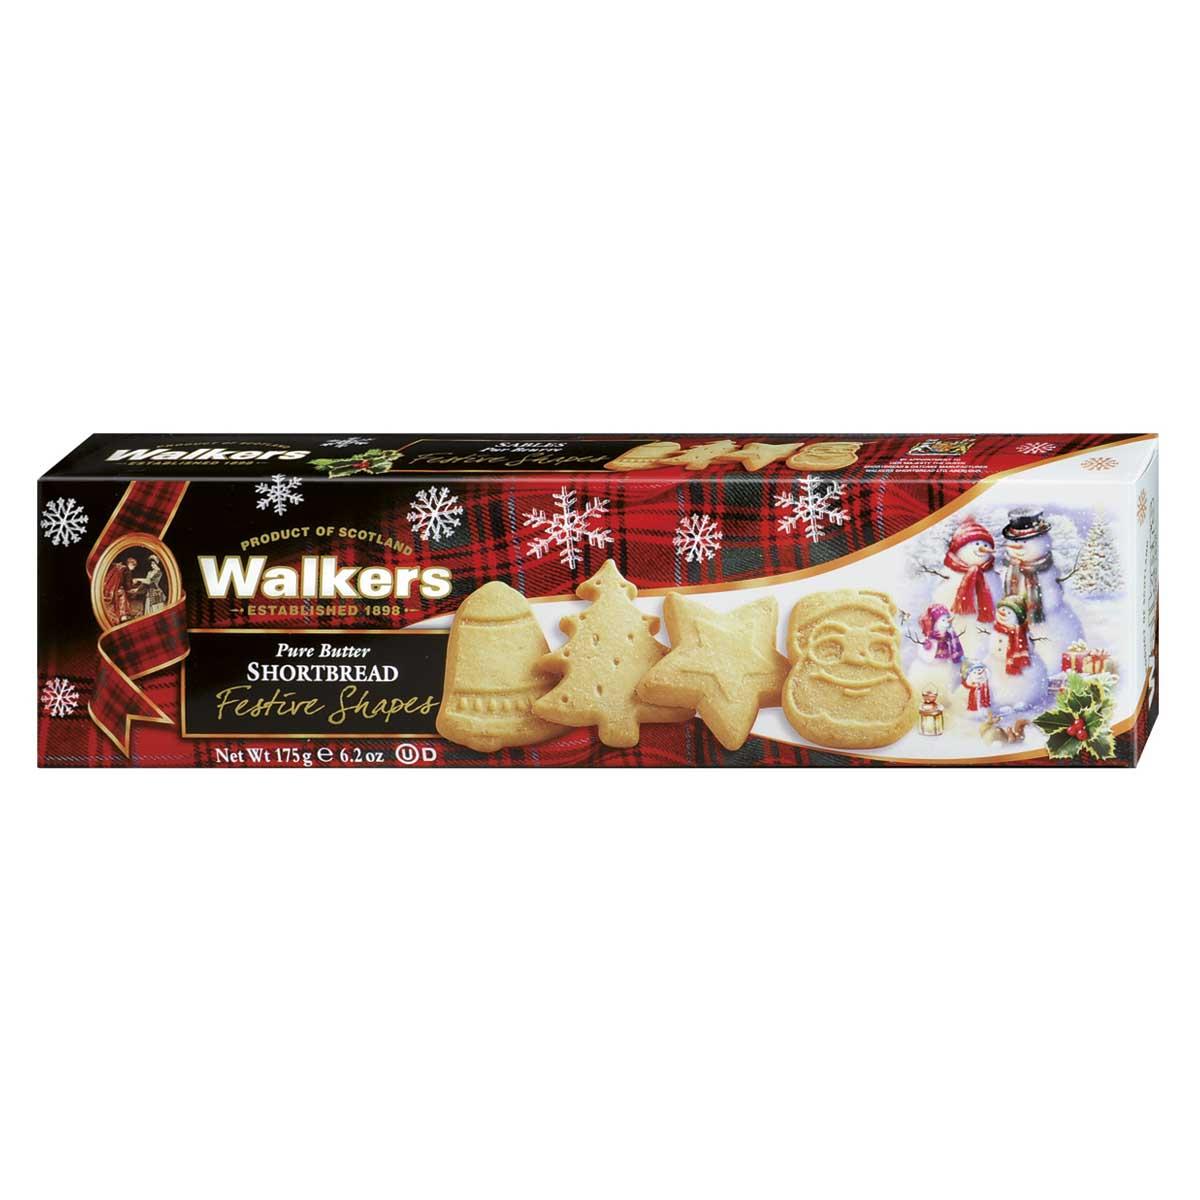 Walkers Shortbread – Festive Shapes Shortbread 175g.